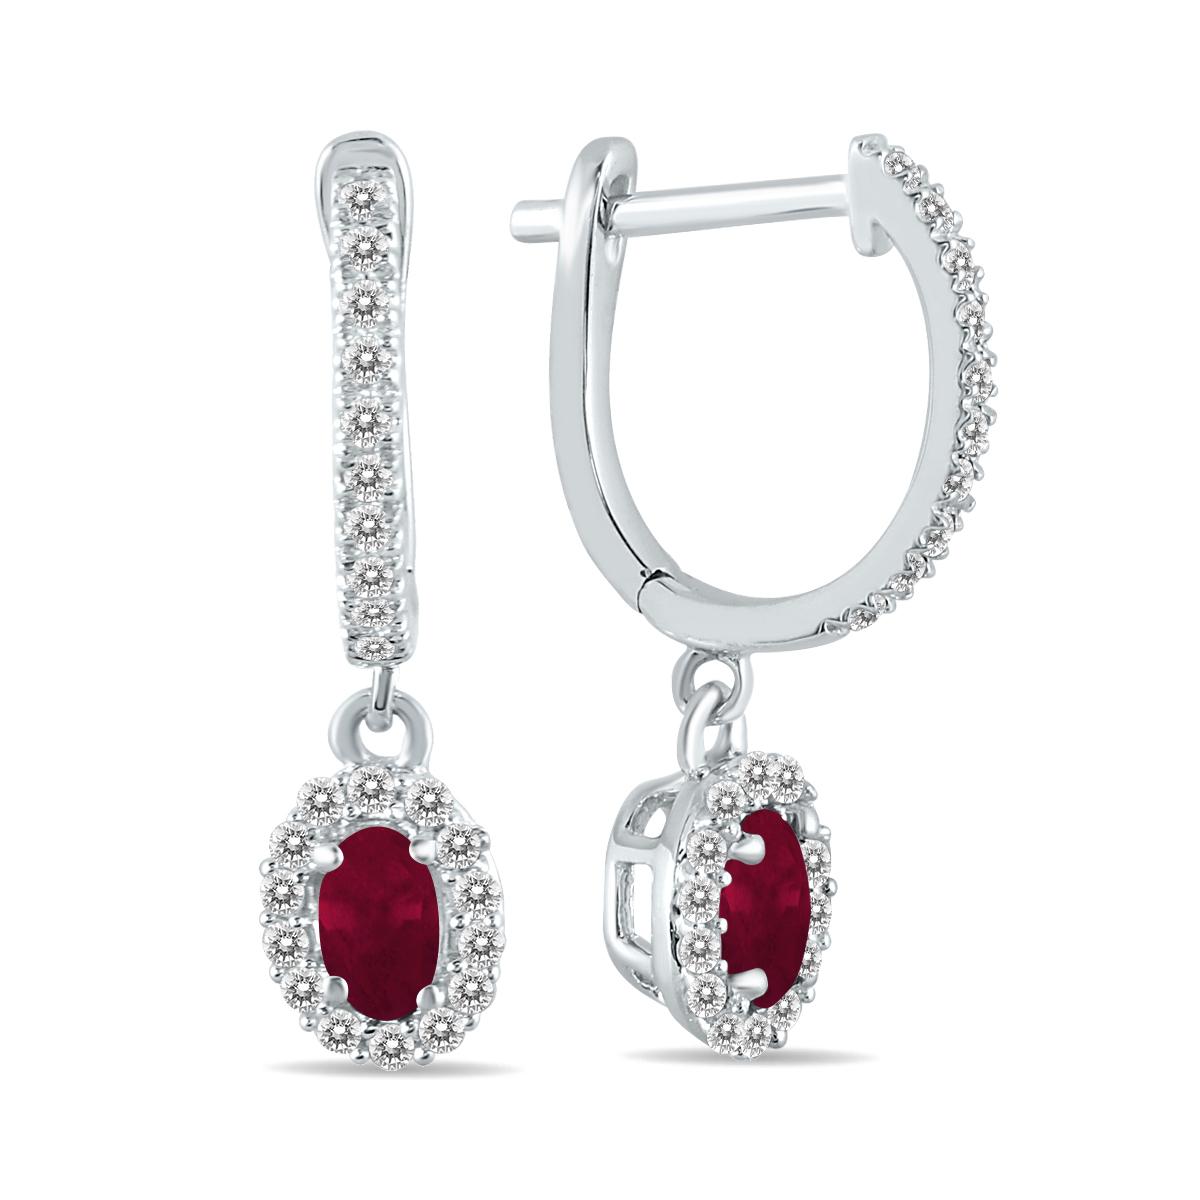 szul.com 1/2 Carat Ruby and Diamond Halo Dangle Earrings in 10K White Gold at Sears.com